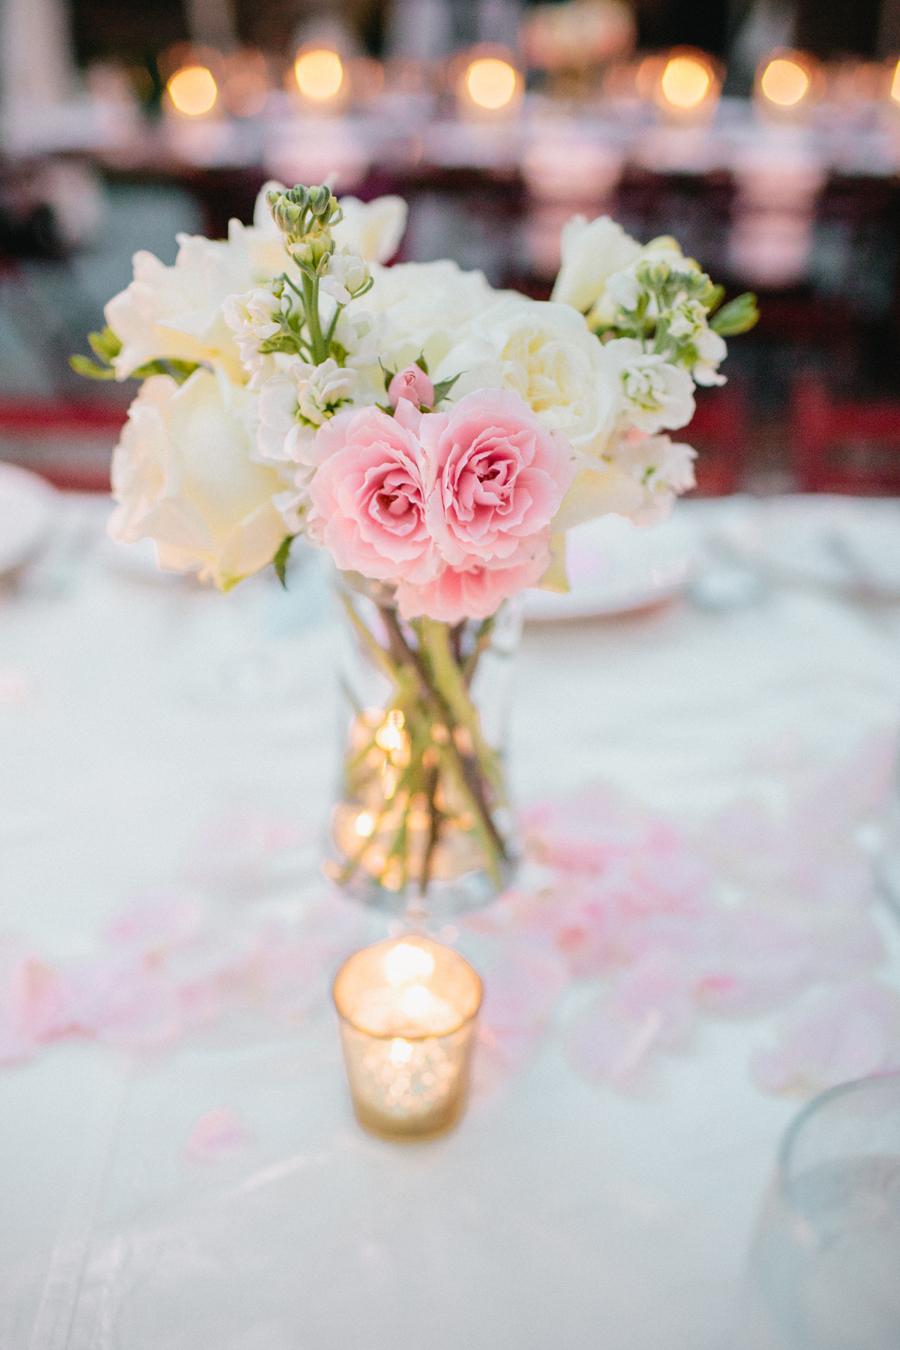 Amazing Wedding Flowers And Decorations Images - The Wedding Ideas ...